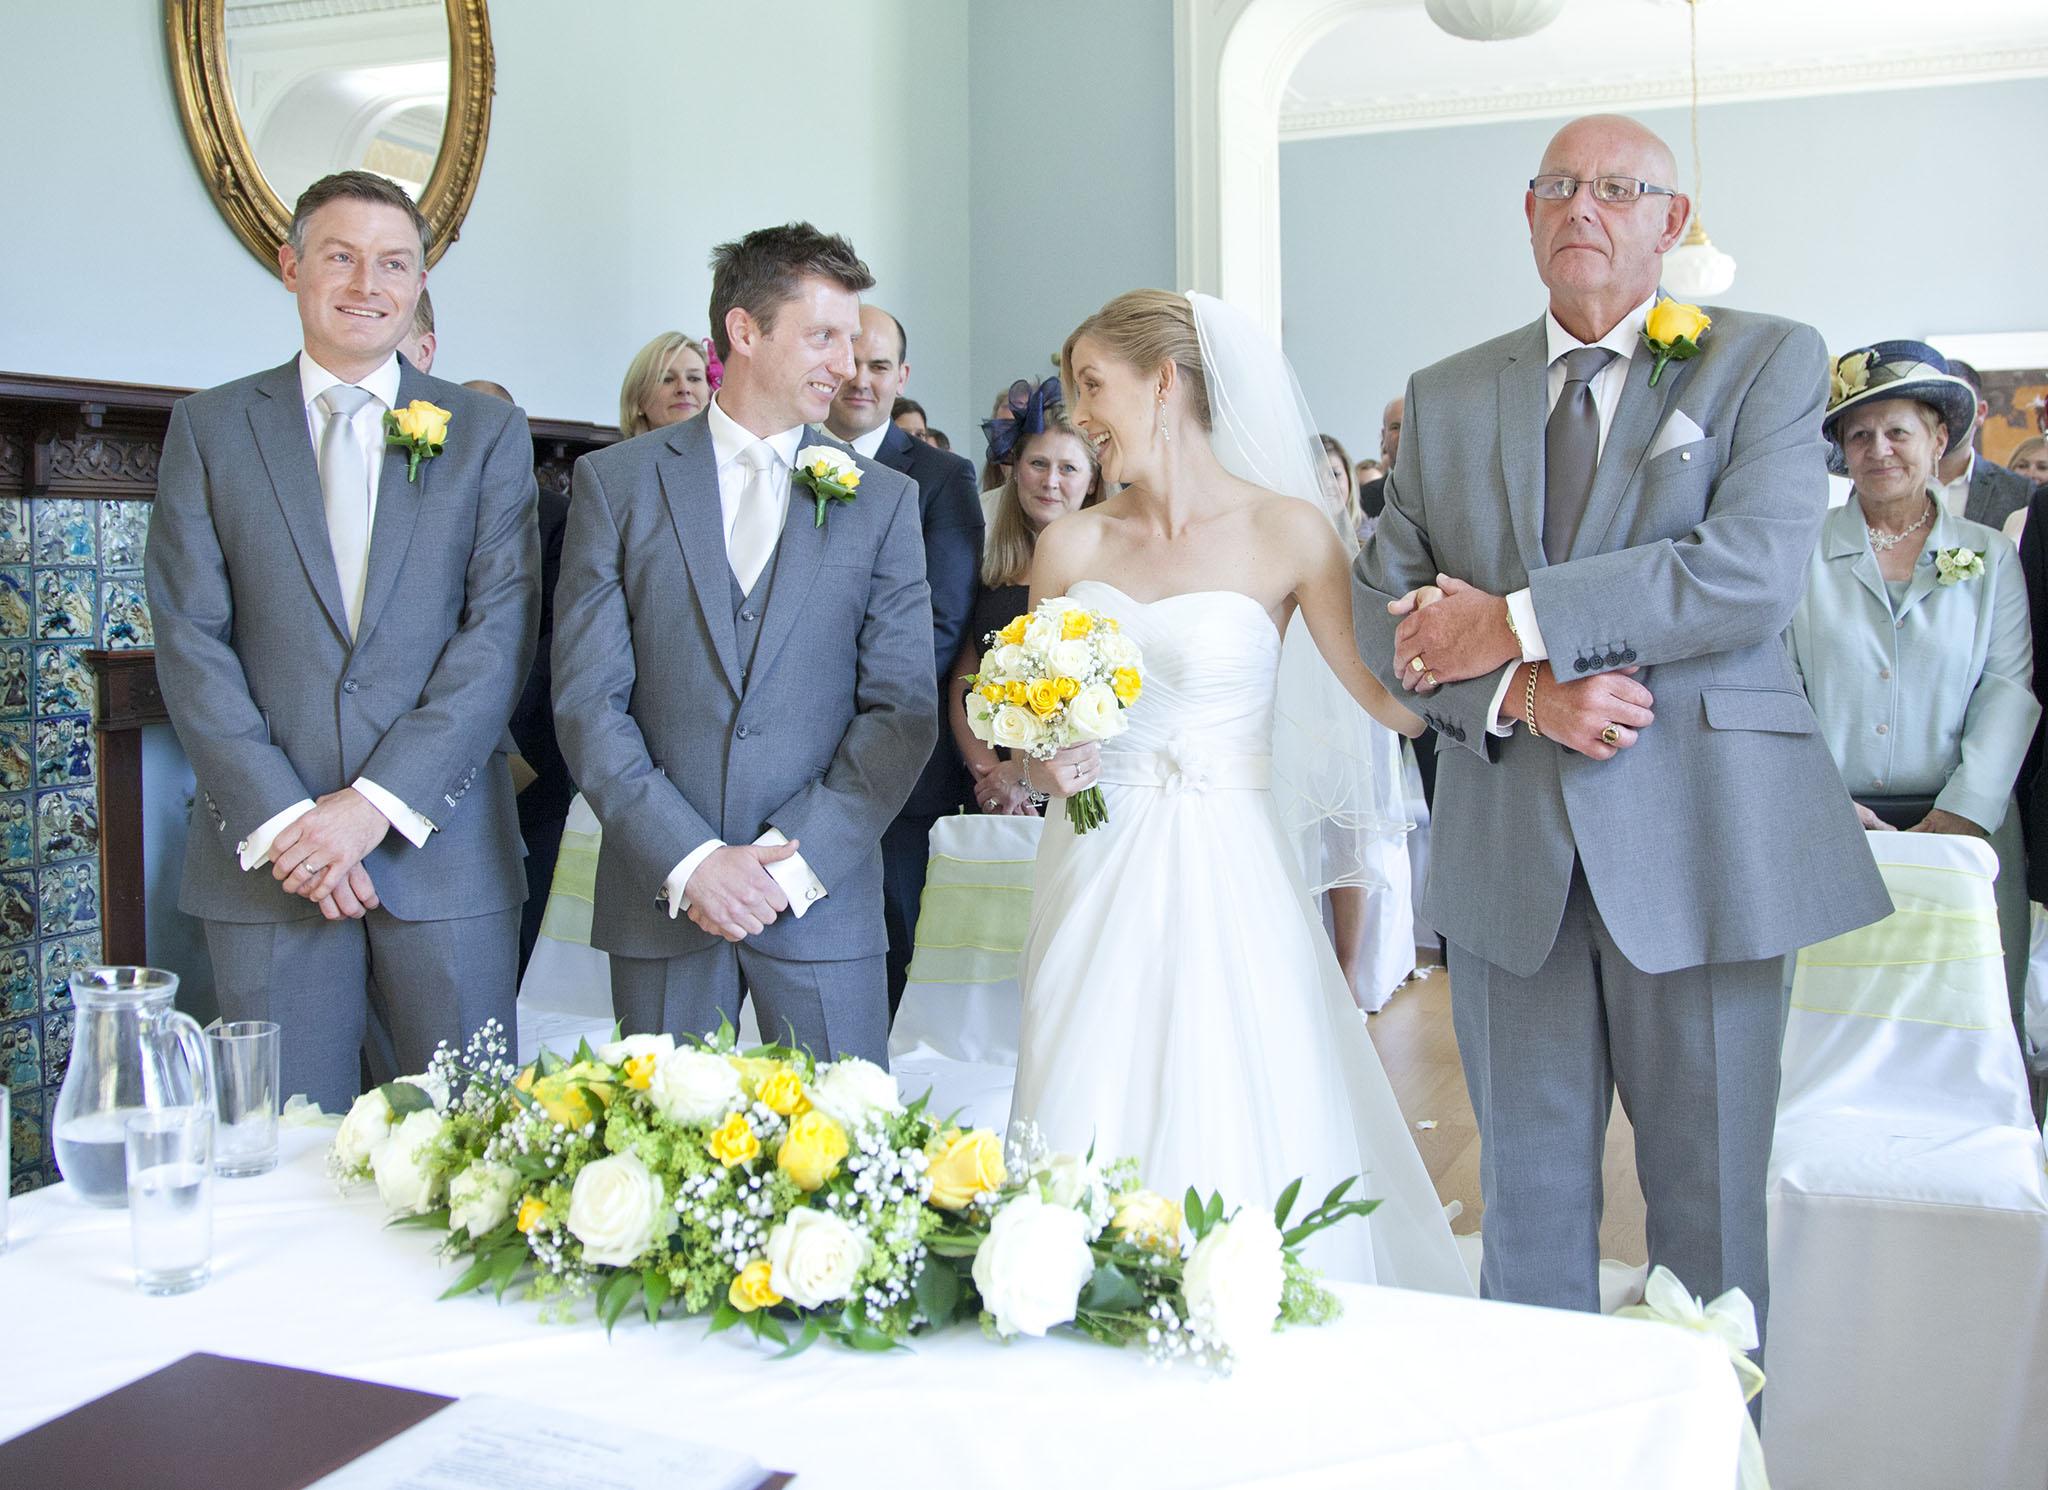 elizabethg_fineart_photography_hertfordshire_rachel_adam_wedding_highelmsmanor_19.jpg